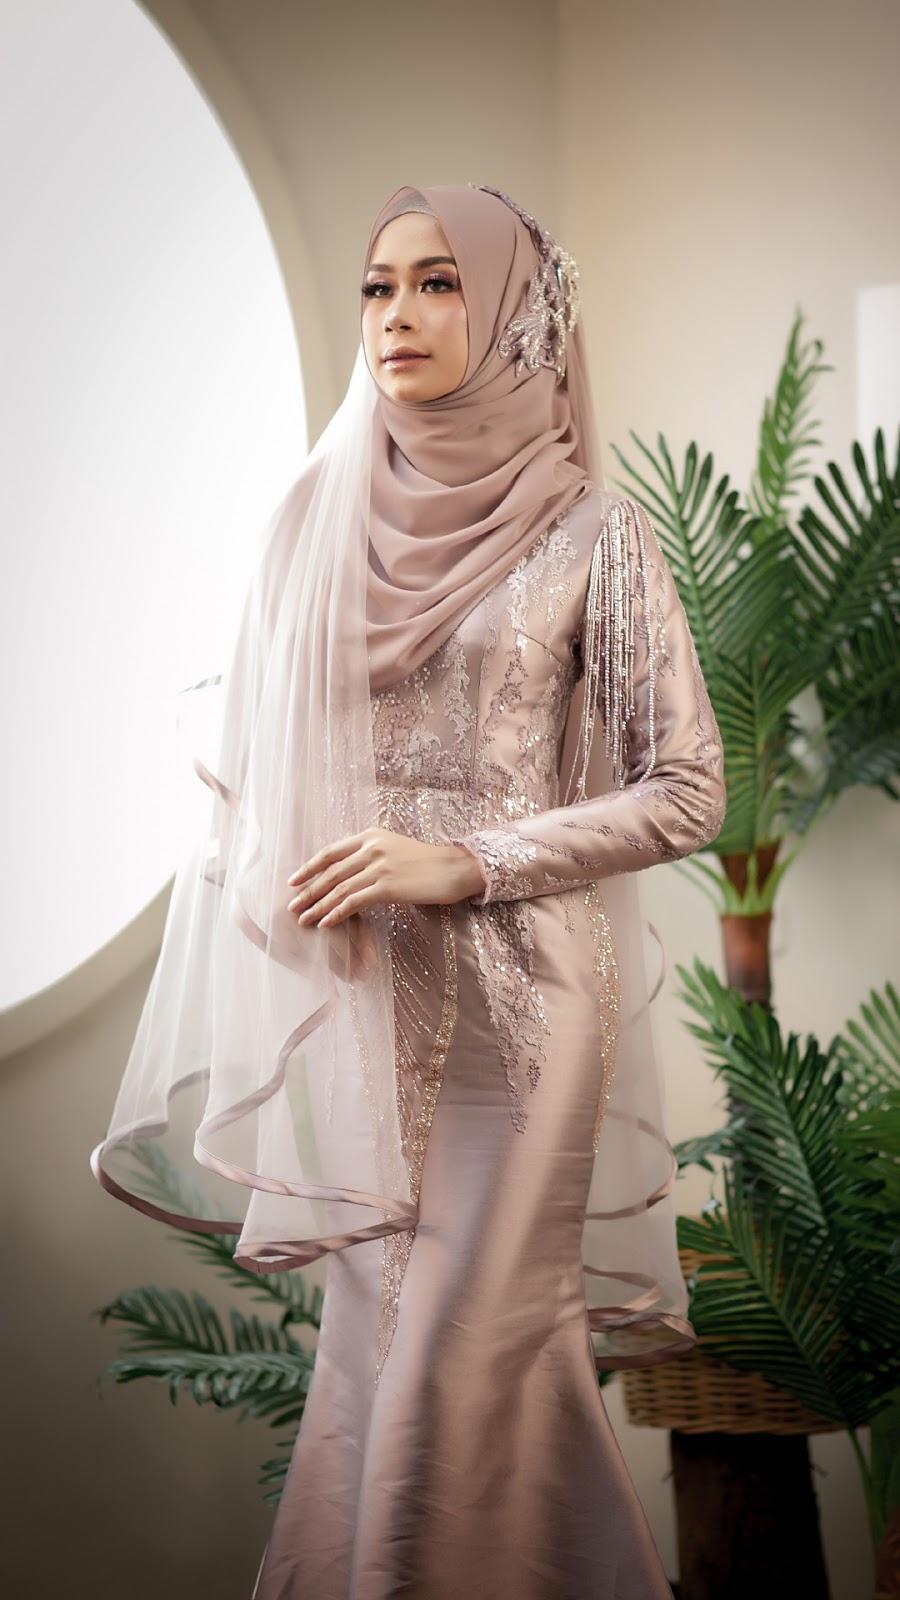 wallpaper HD muslimah cantik hijab kebawaya modern